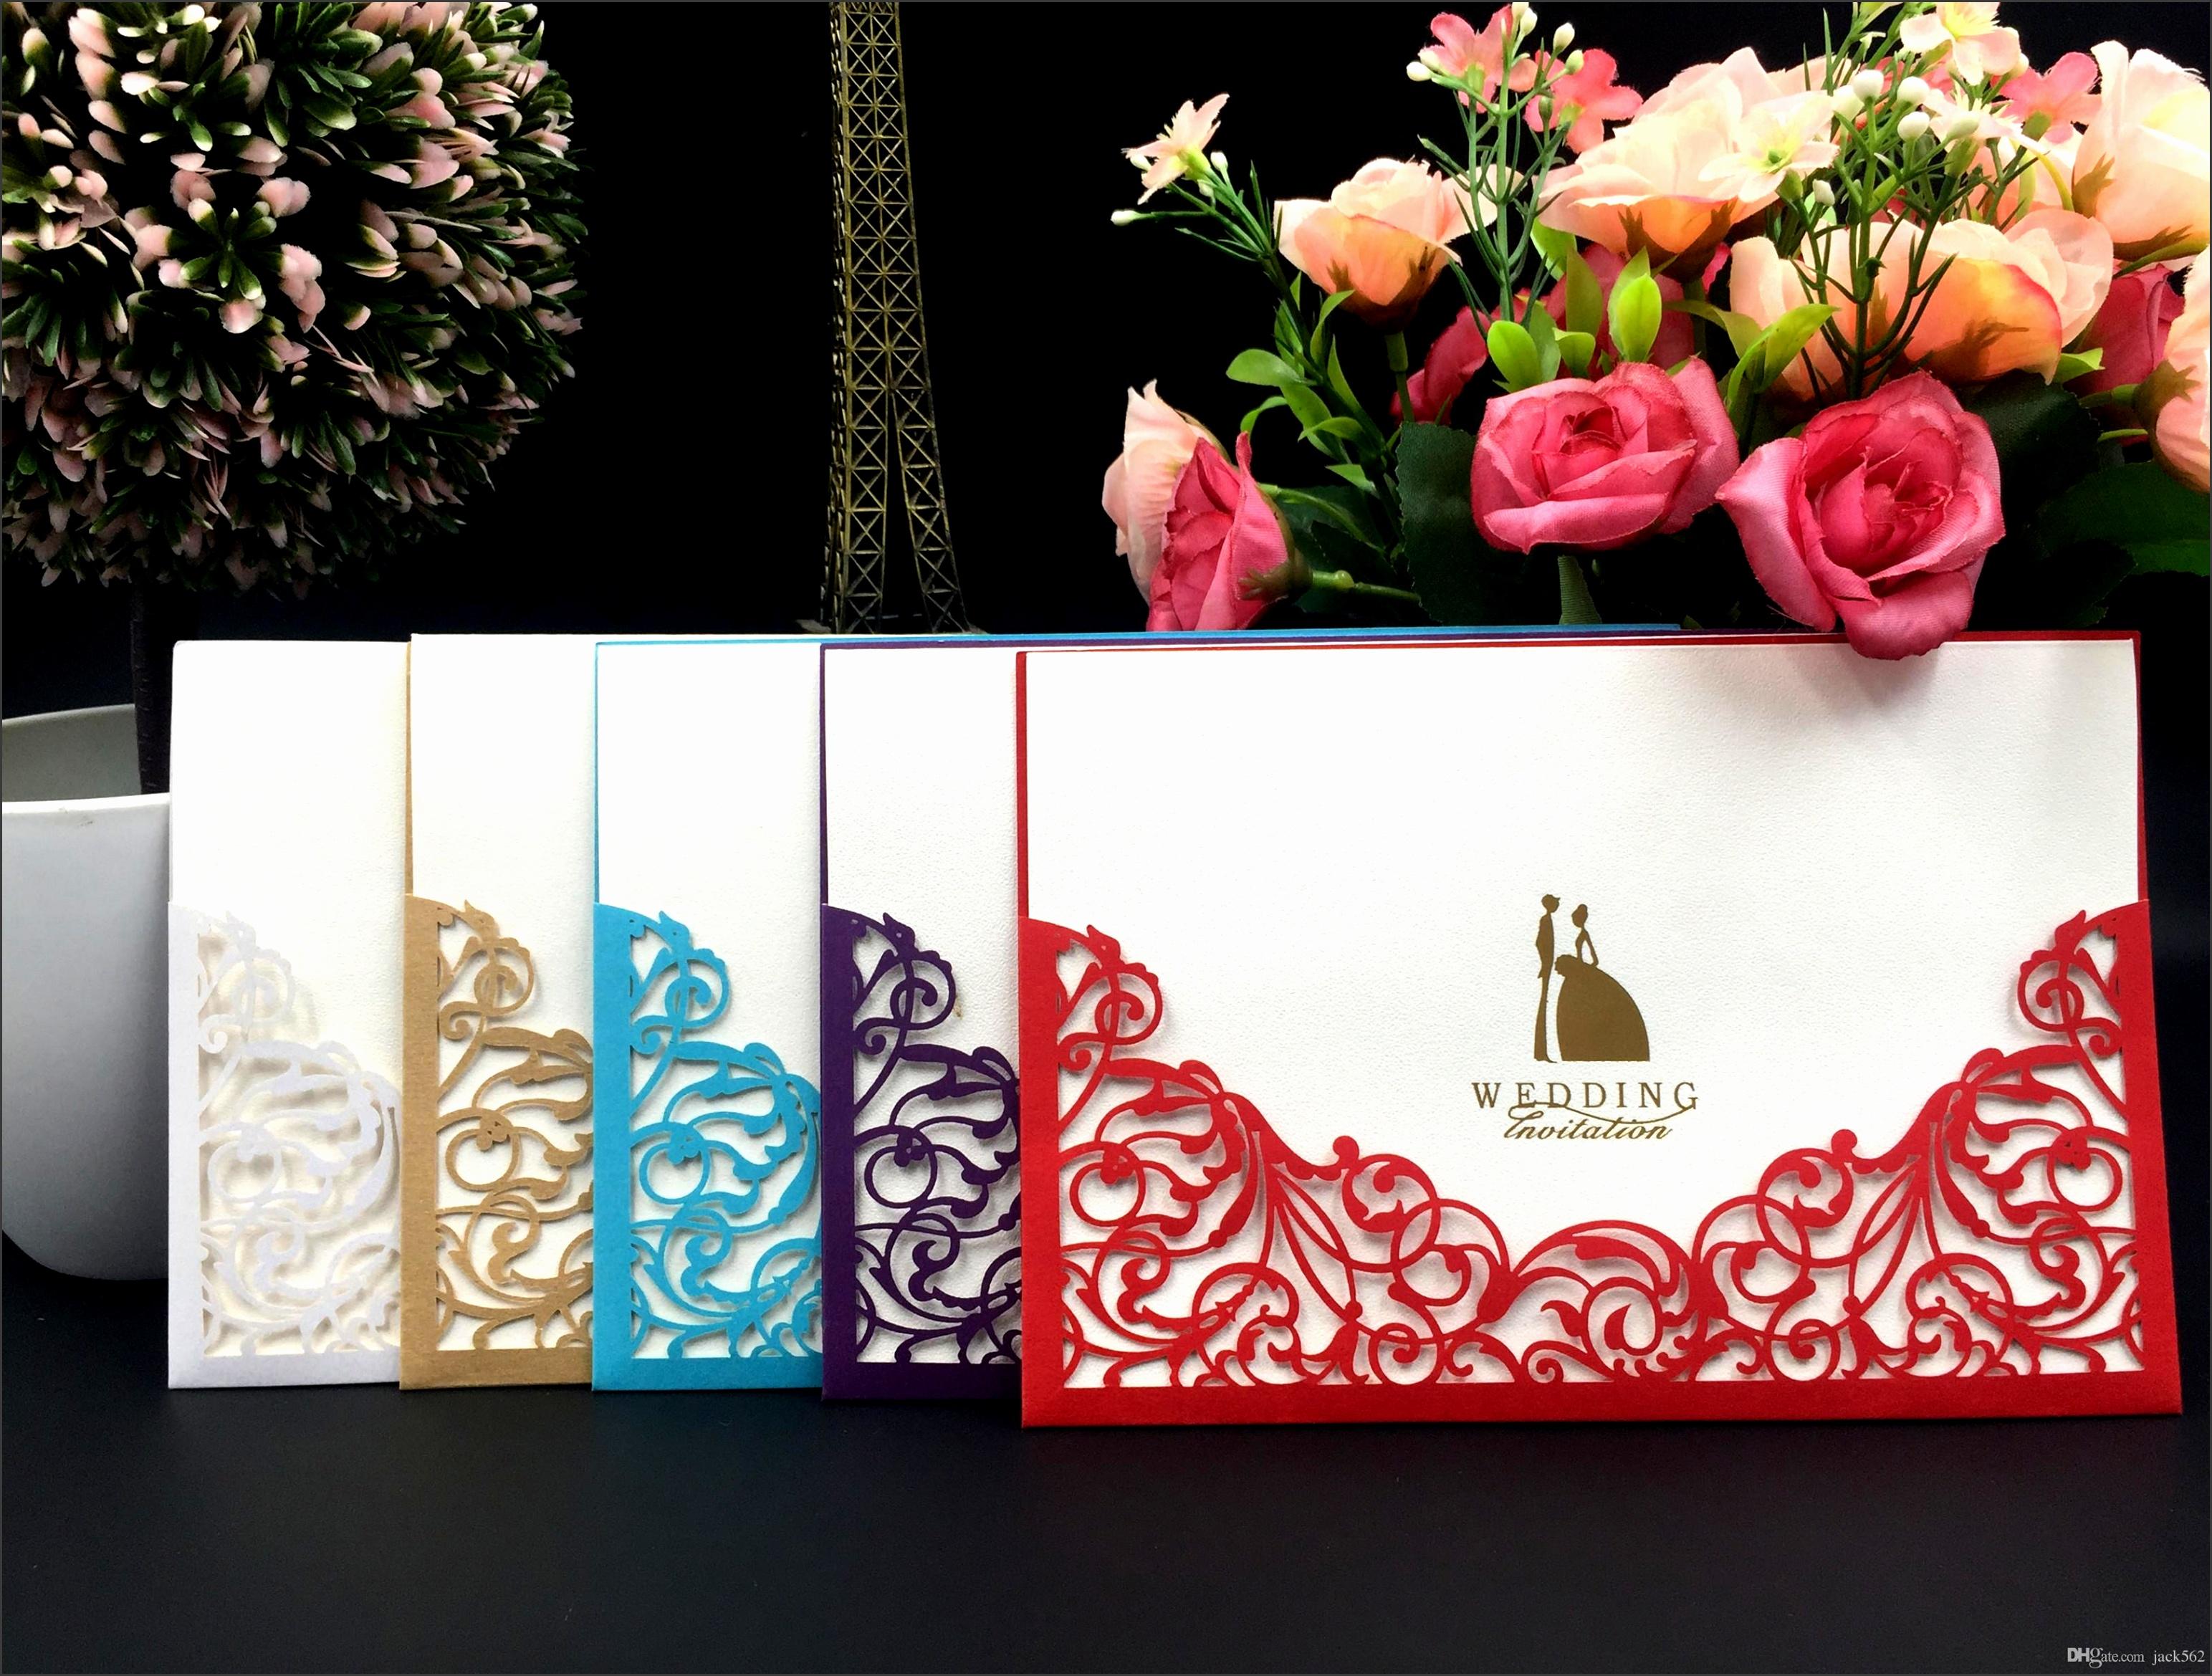 2016 Formal Wedding Invitation Card Design Luxurious Wedding Invitation Cards Latest Wedding Card Greeting Cards Summer Wedding Invitations Templates For